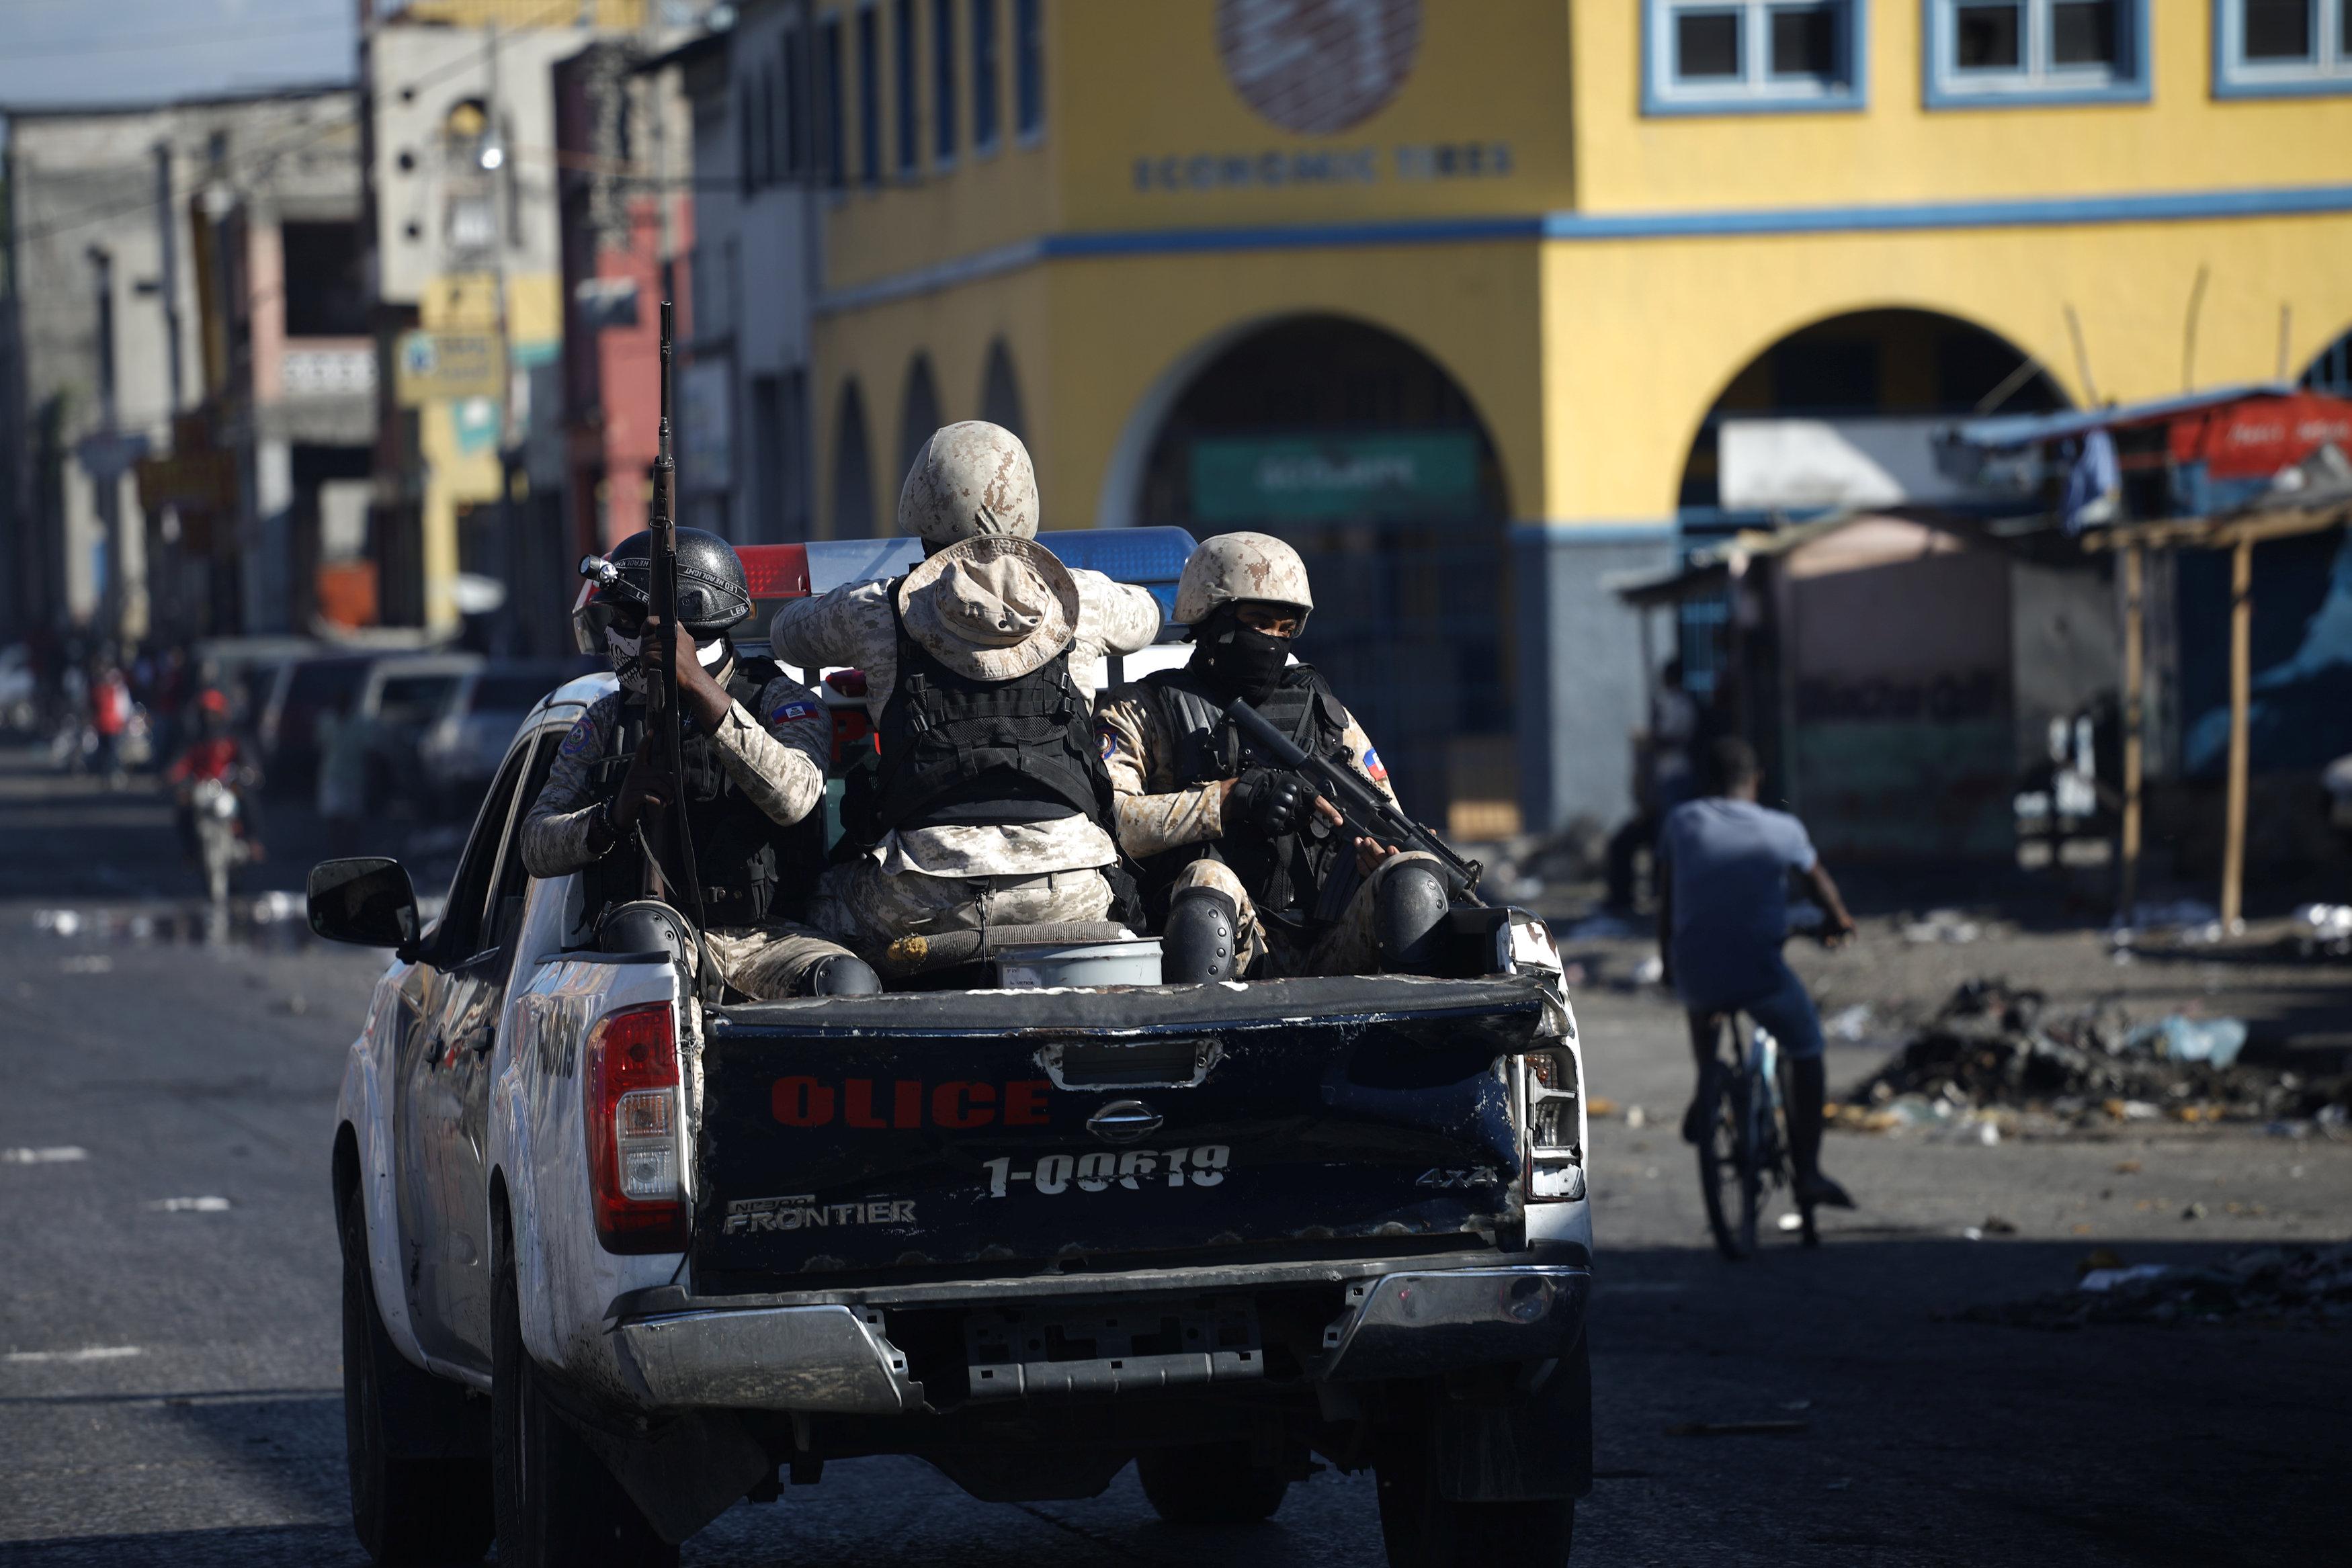 933634-شرطة-هايتى